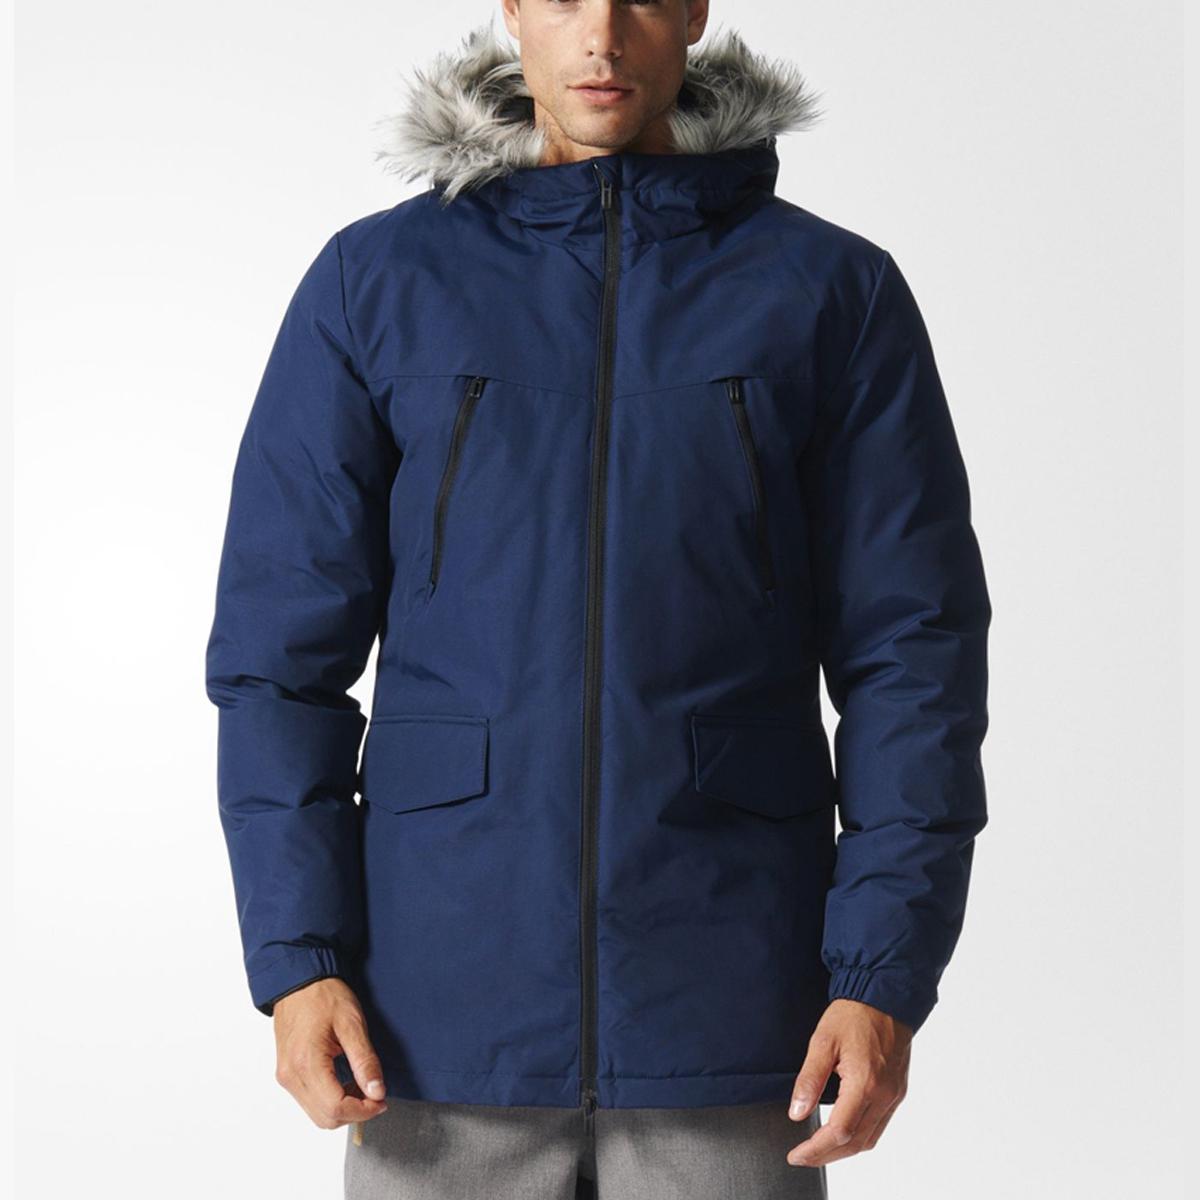 New da Giacca Adidas Jacket Sdp Fur uomo q7qFA1nT